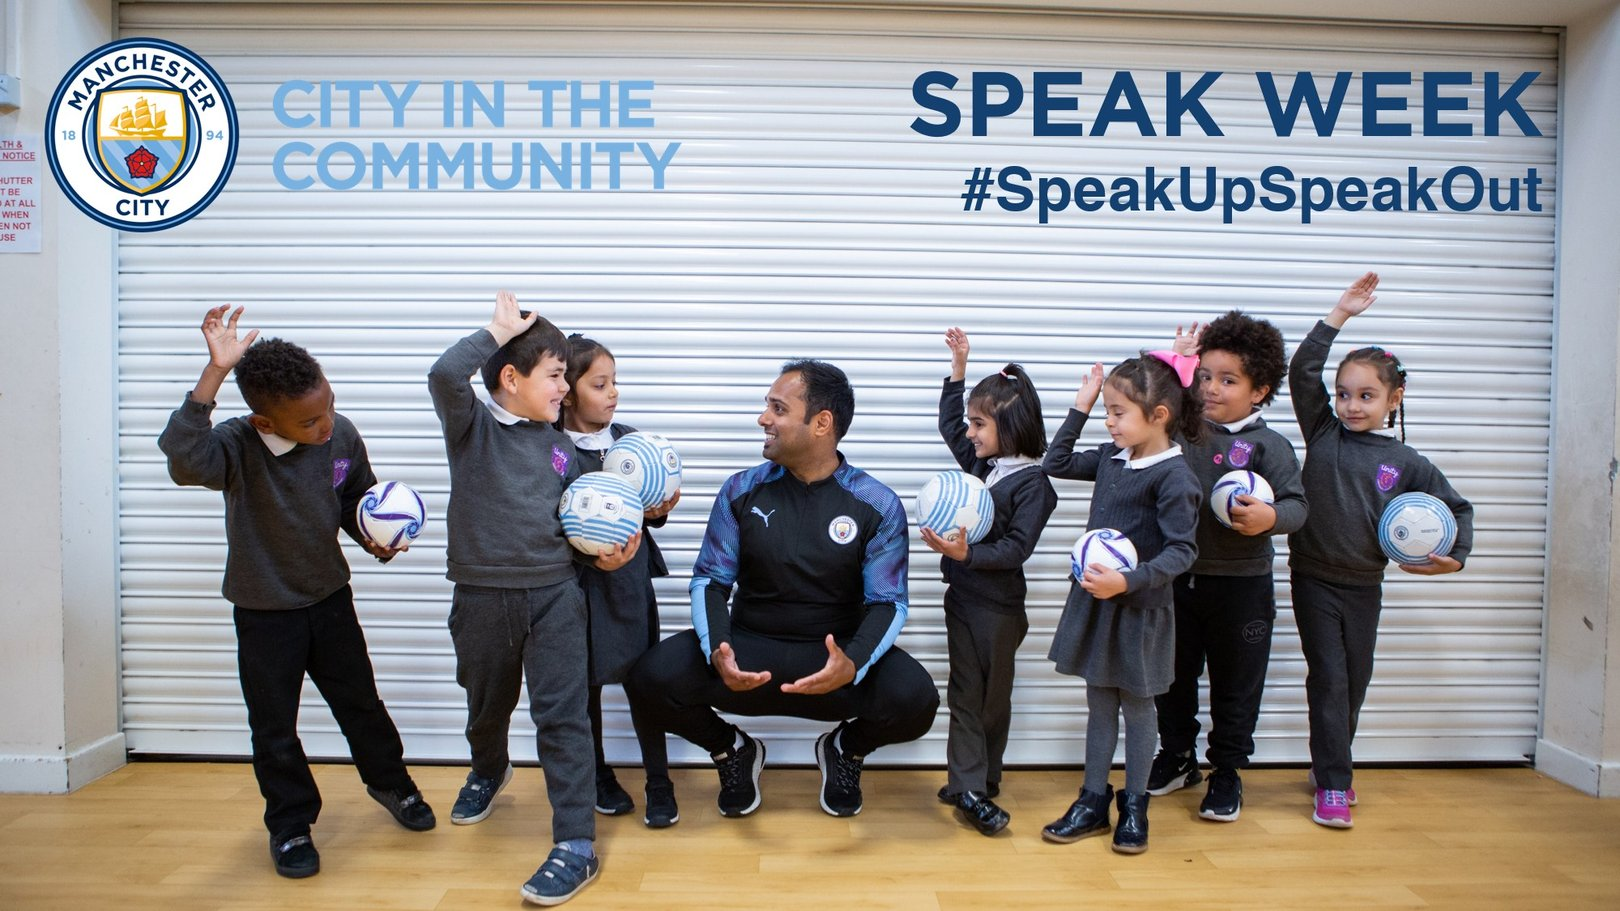 City In The Community celebrates Speak Week